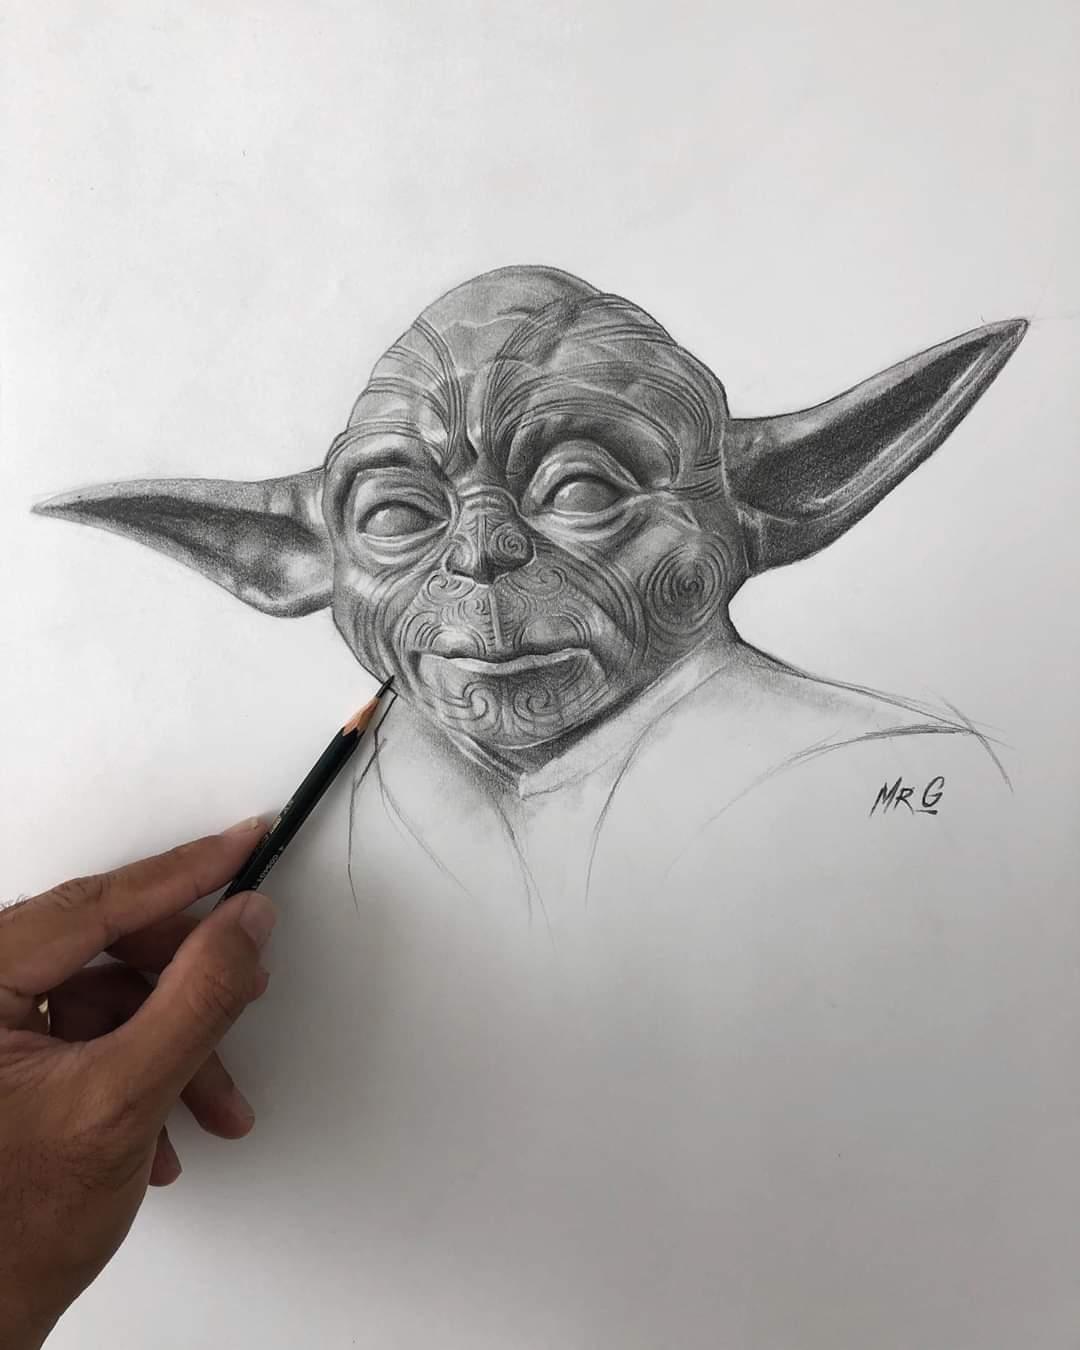 Maori Yoda - By Mr G